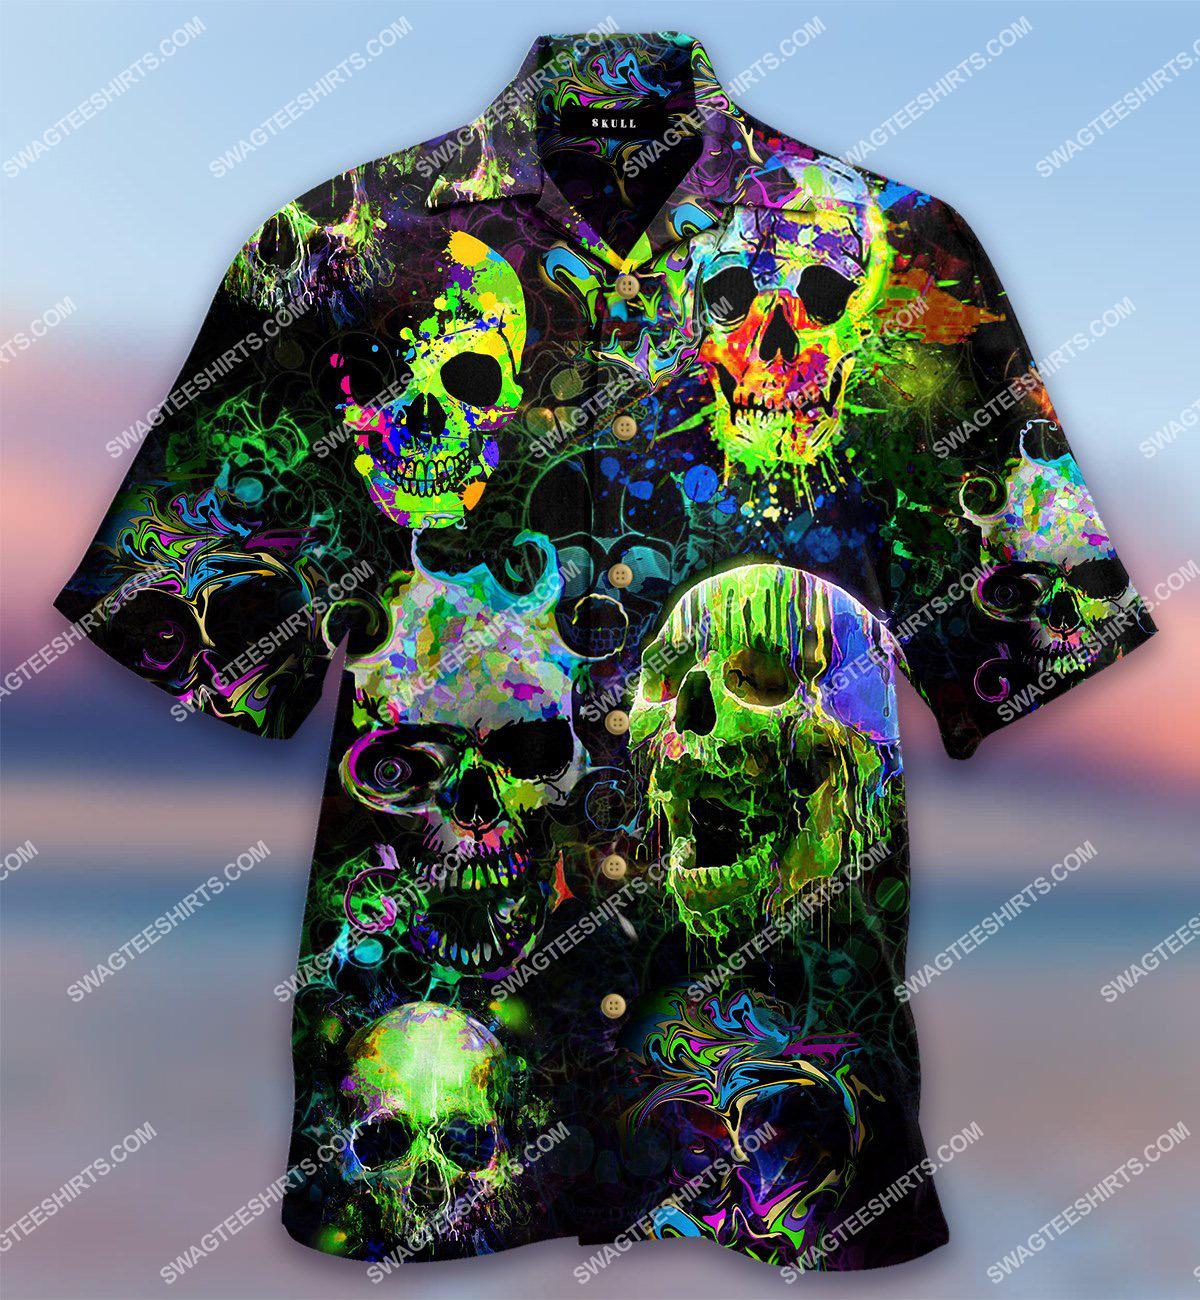 skull watercolor all over printed hawaiian shirt 1(1)